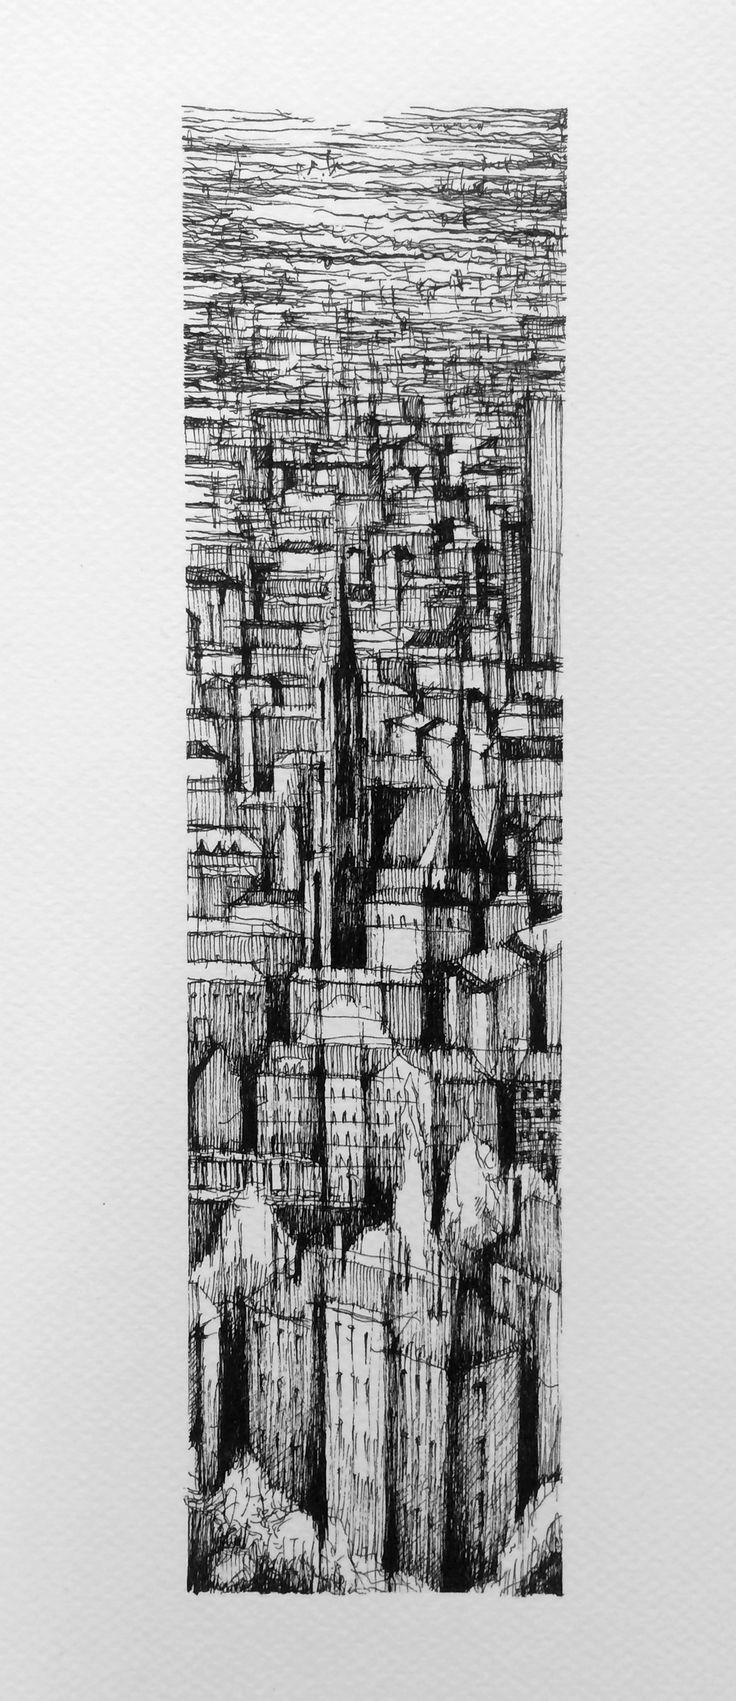 VIENNA VERTICAL III Drawing on paper, 20cmx40cm, ink  © Pavel Filgas 2016